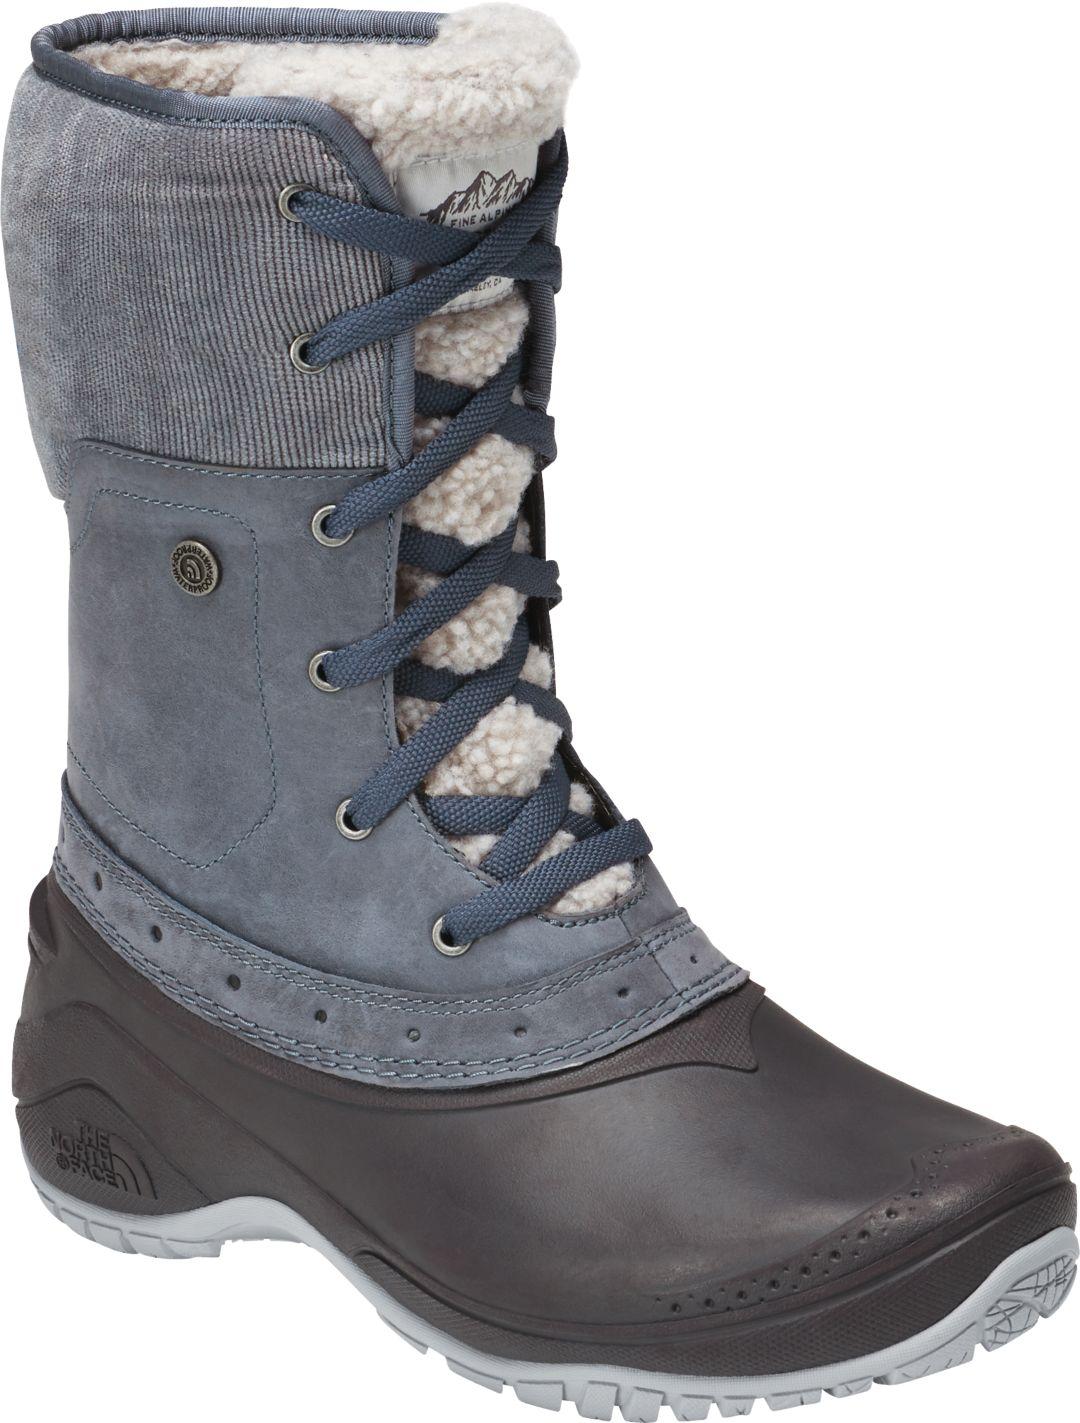 d719a8433 The North Face Women's Shellista Roll-Down 200g Waterproof Winter Boots